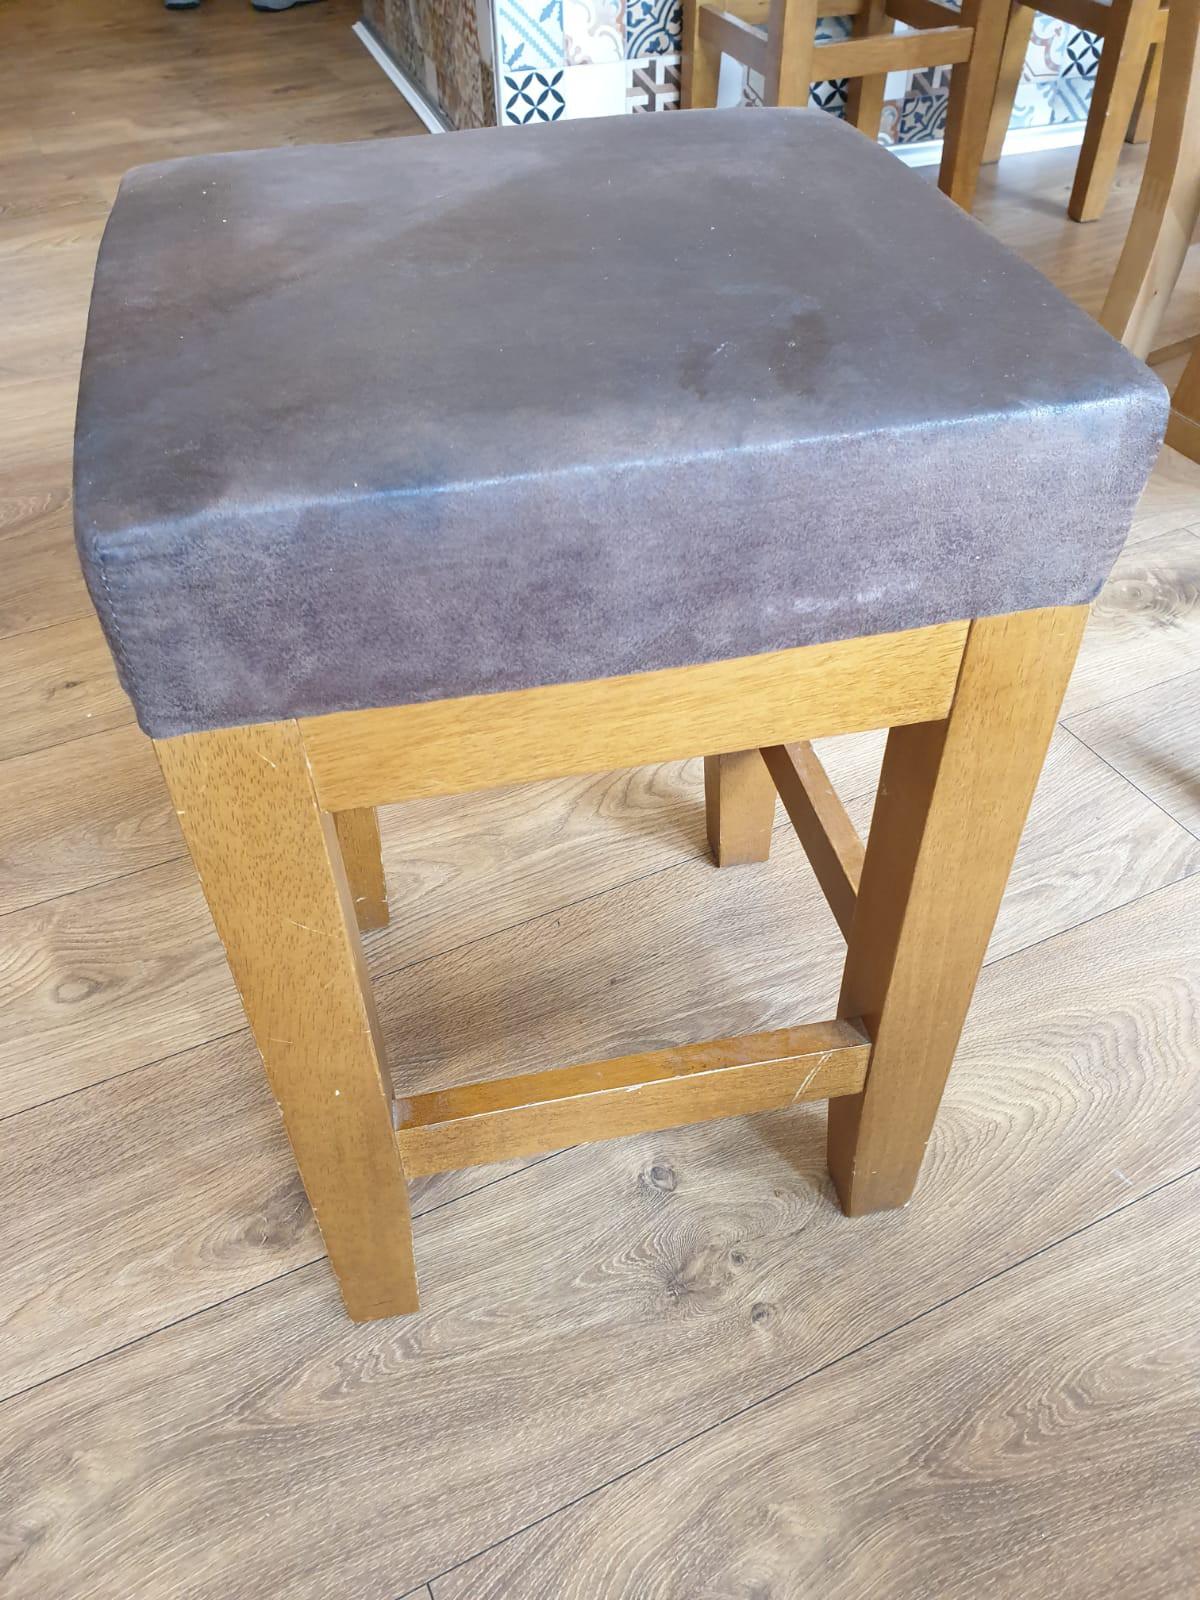 secondhand pub equipment bar stools used stools bar stools merseyside. Black Bedroom Furniture Sets. Home Design Ideas